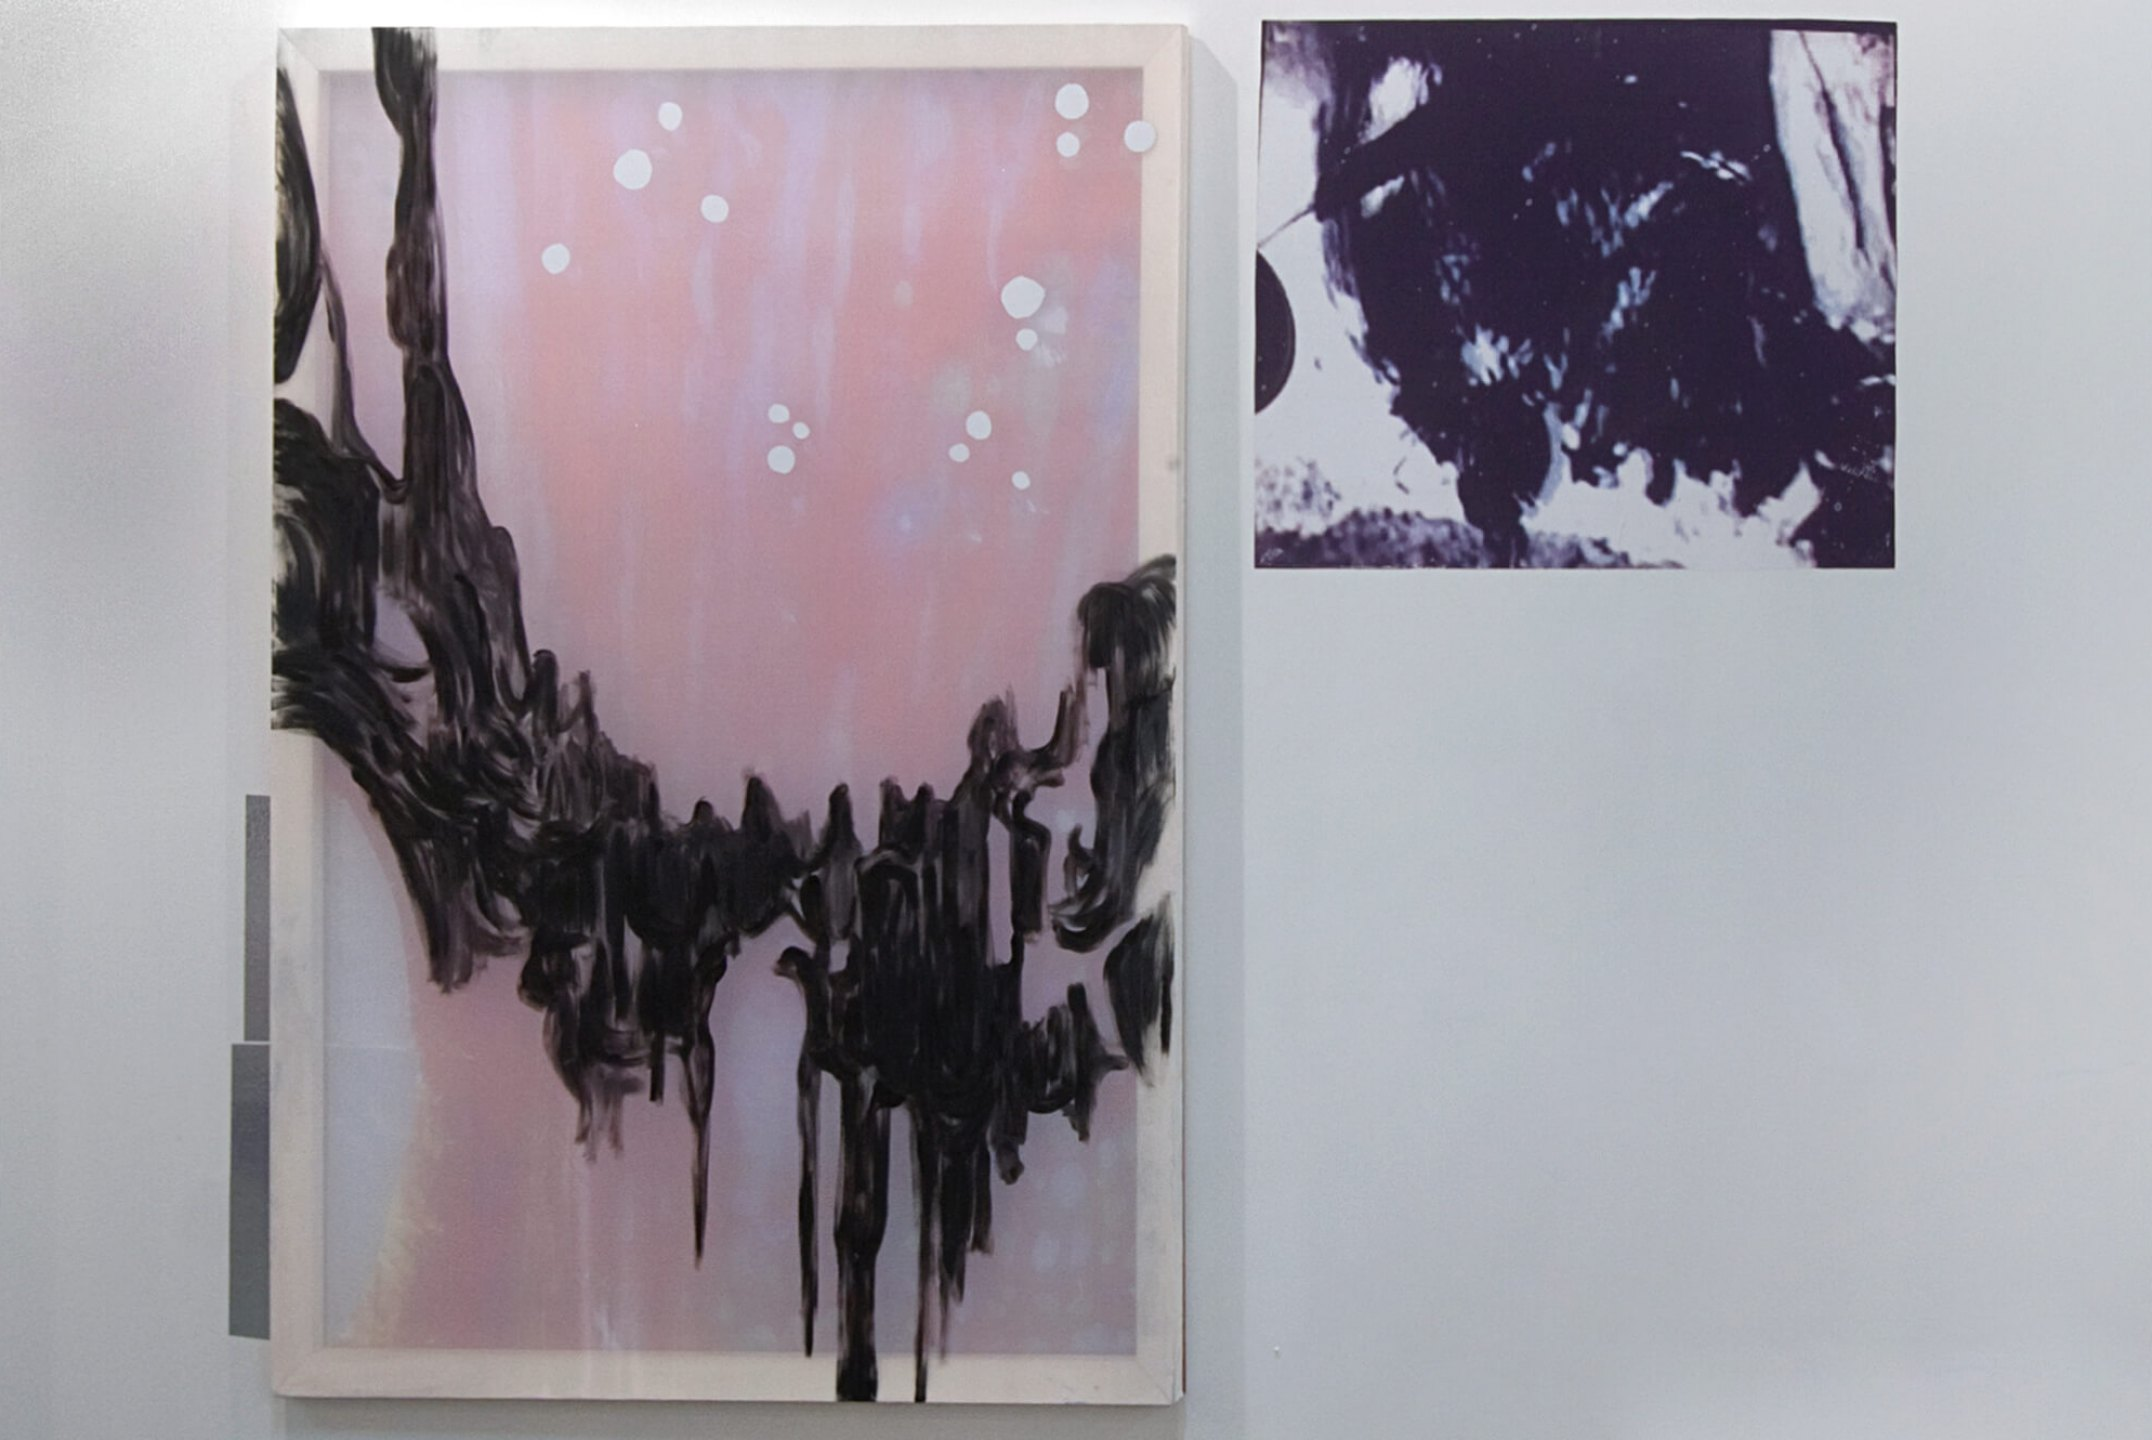 Marina Perez Simão, <em>Untitled</em>, 2013,&nbsp;acrylic on plastic, polyester, reflective paper and printing on reflective paper, 178&nbsp;× 230 cm&nbsp; - Mendes Wood DM